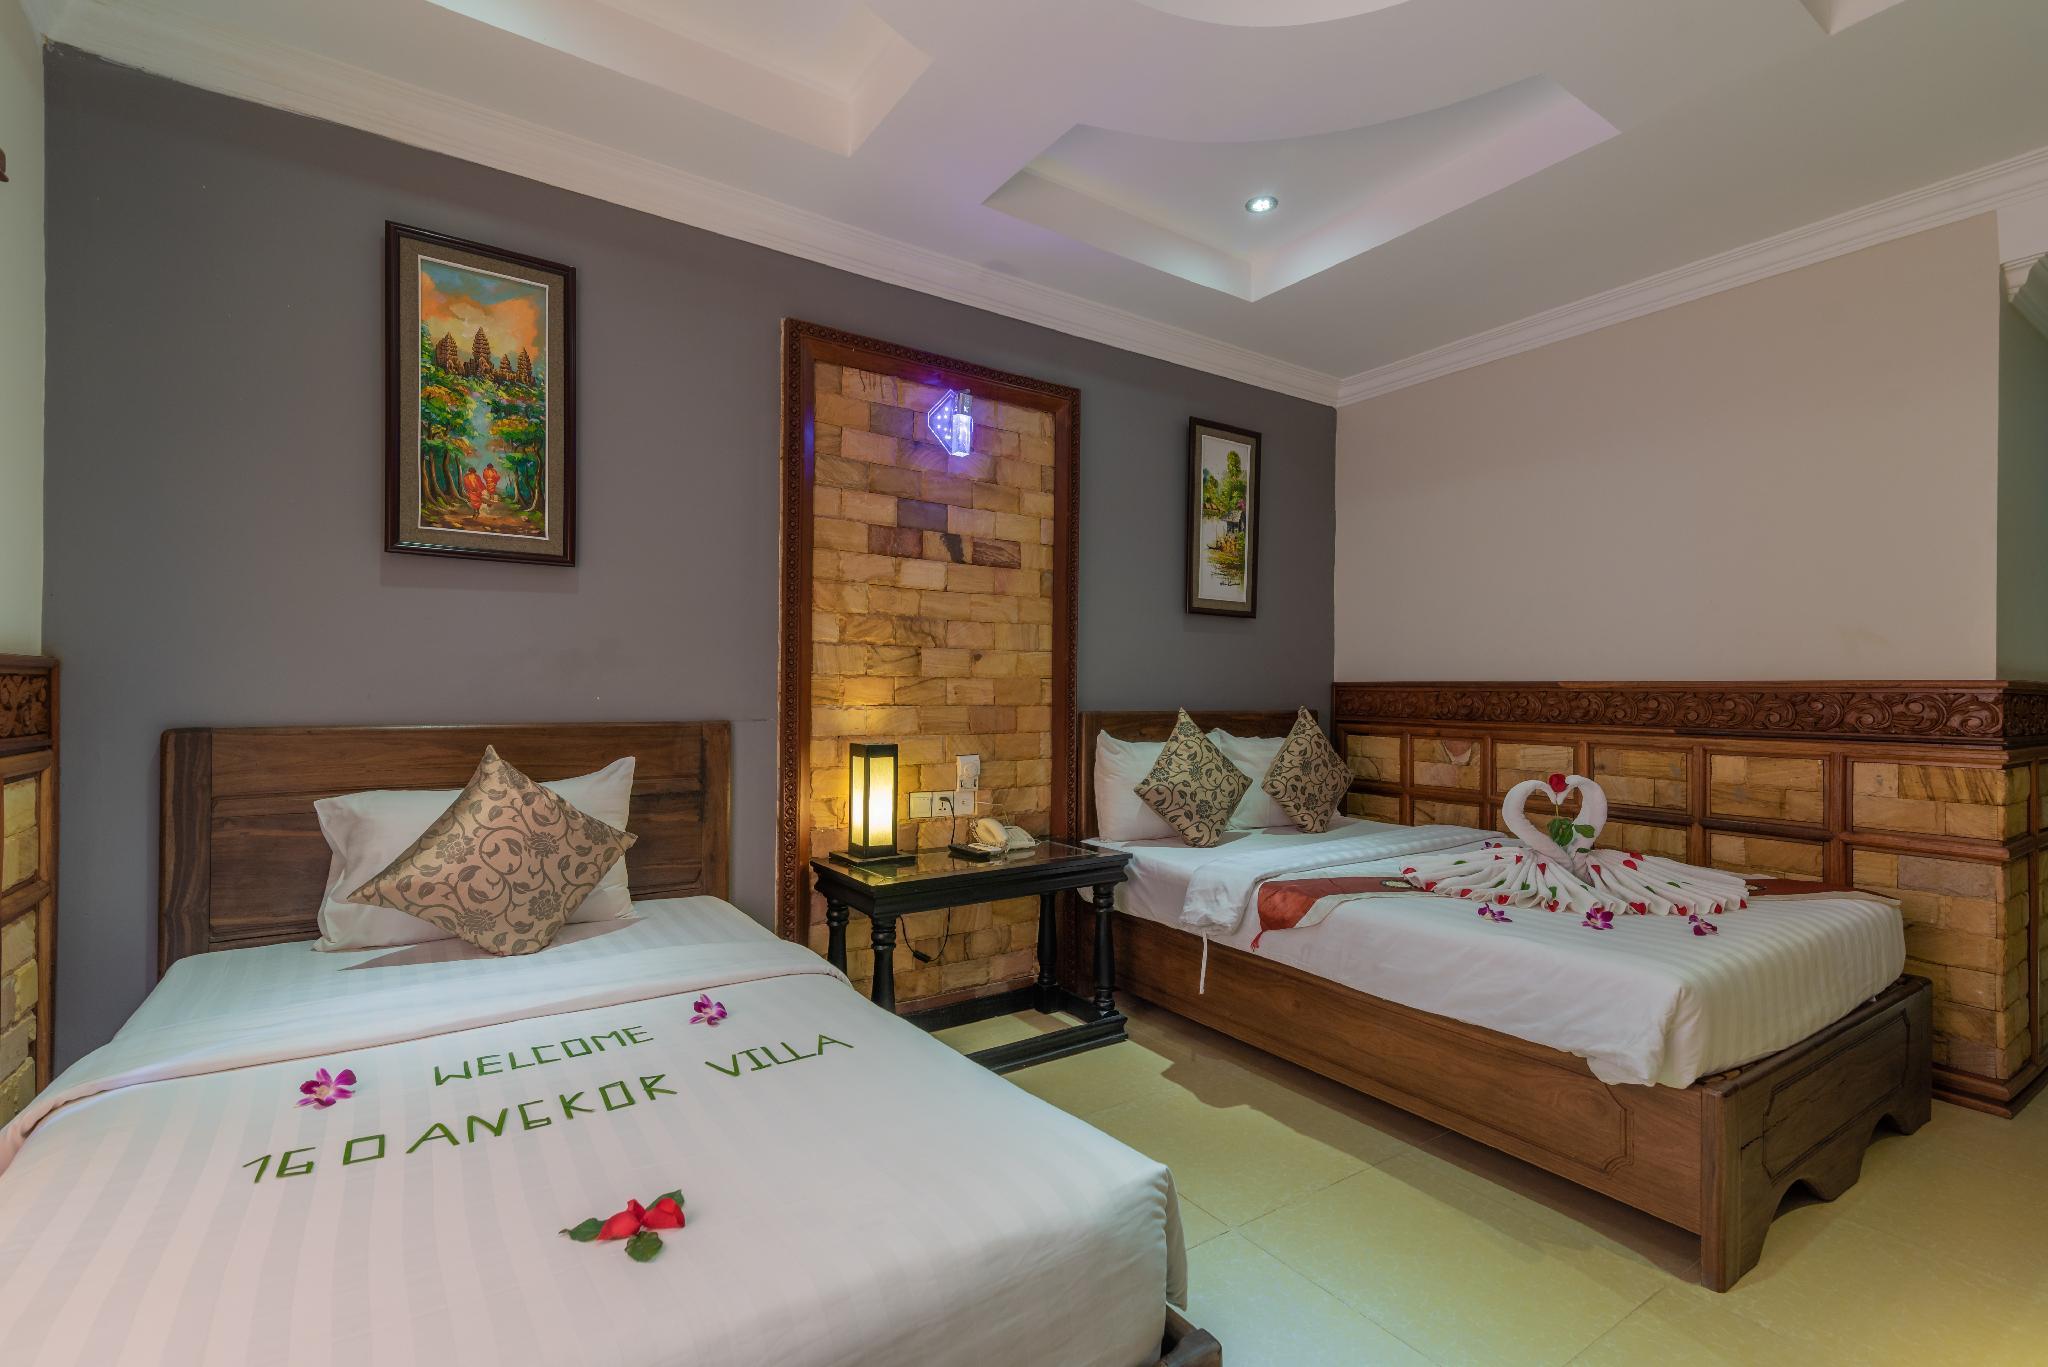 160 Angkor Villa